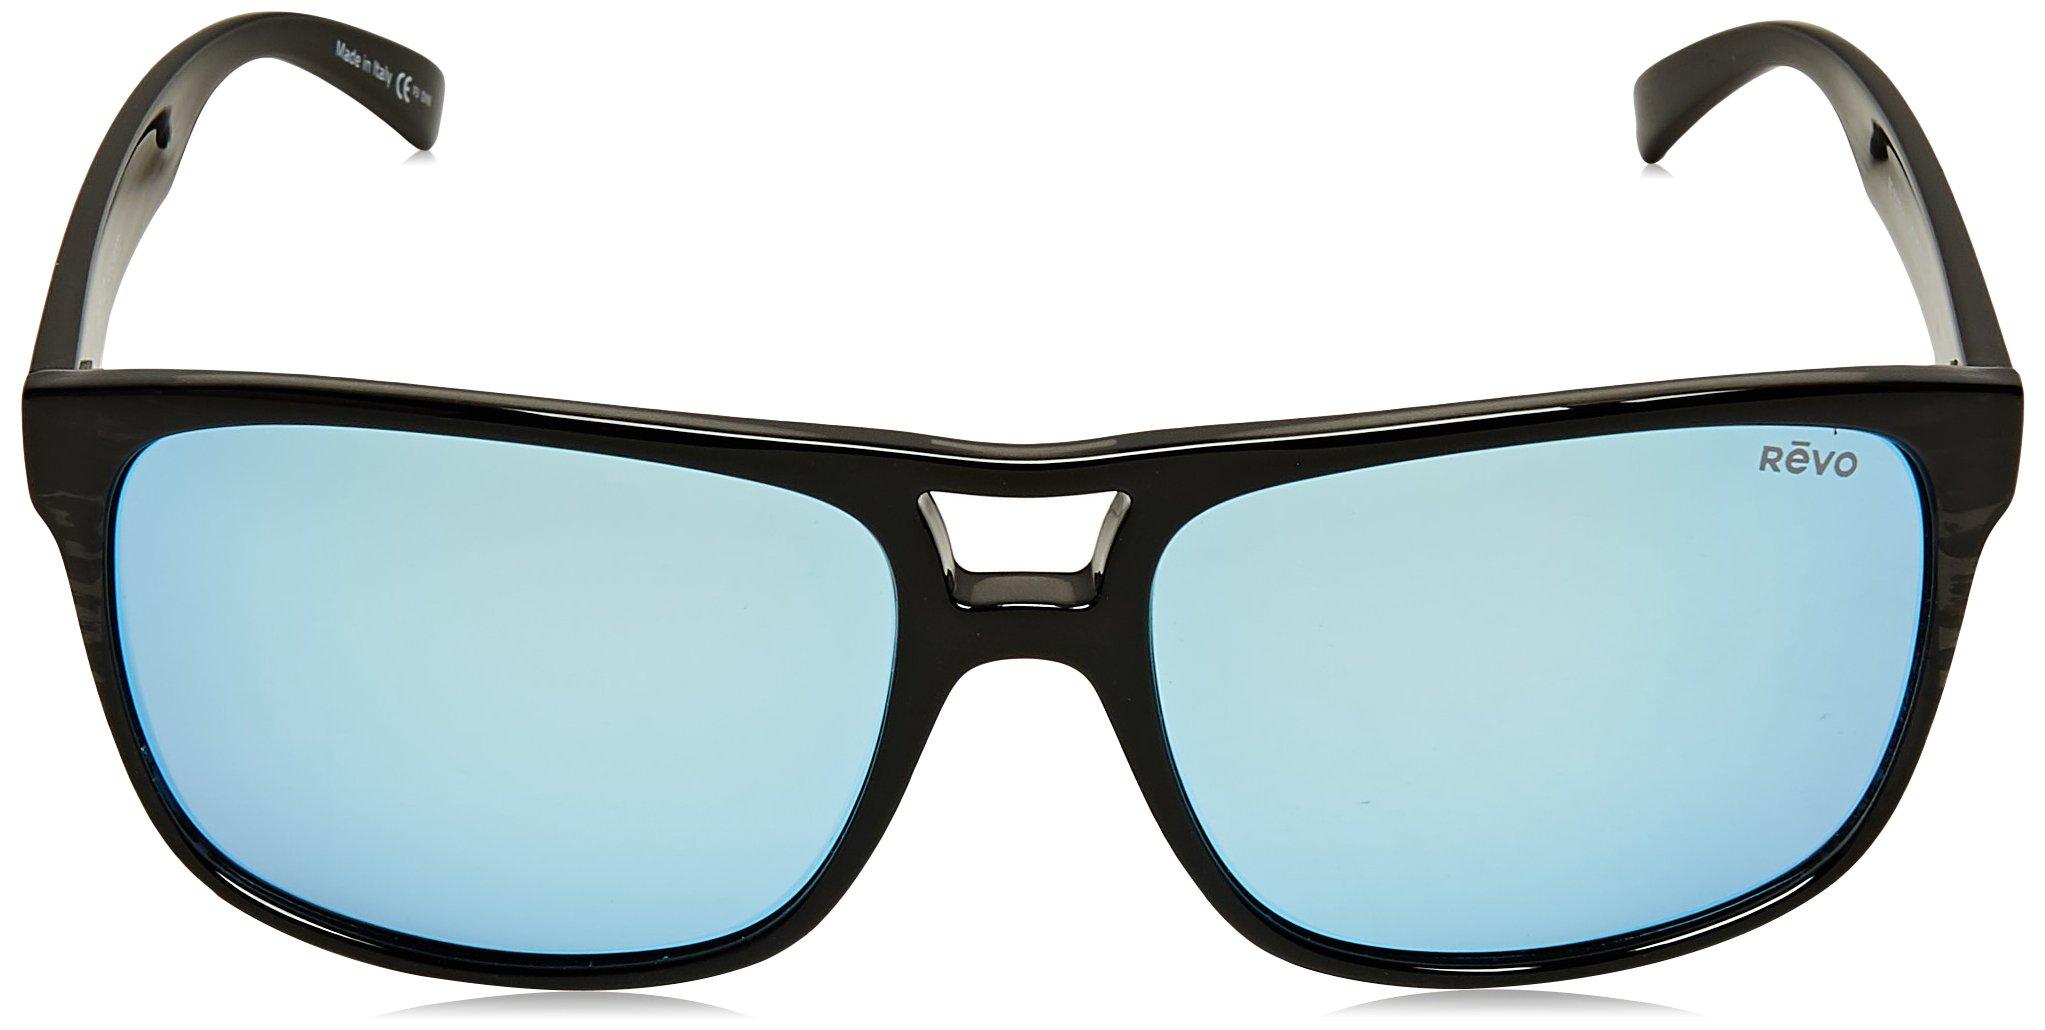 Revo Holsby Style and Performance Polarized Sunglasses, RE1019, Black Woodgrain, 58 mm by Revo Sunglasses (Image #2)